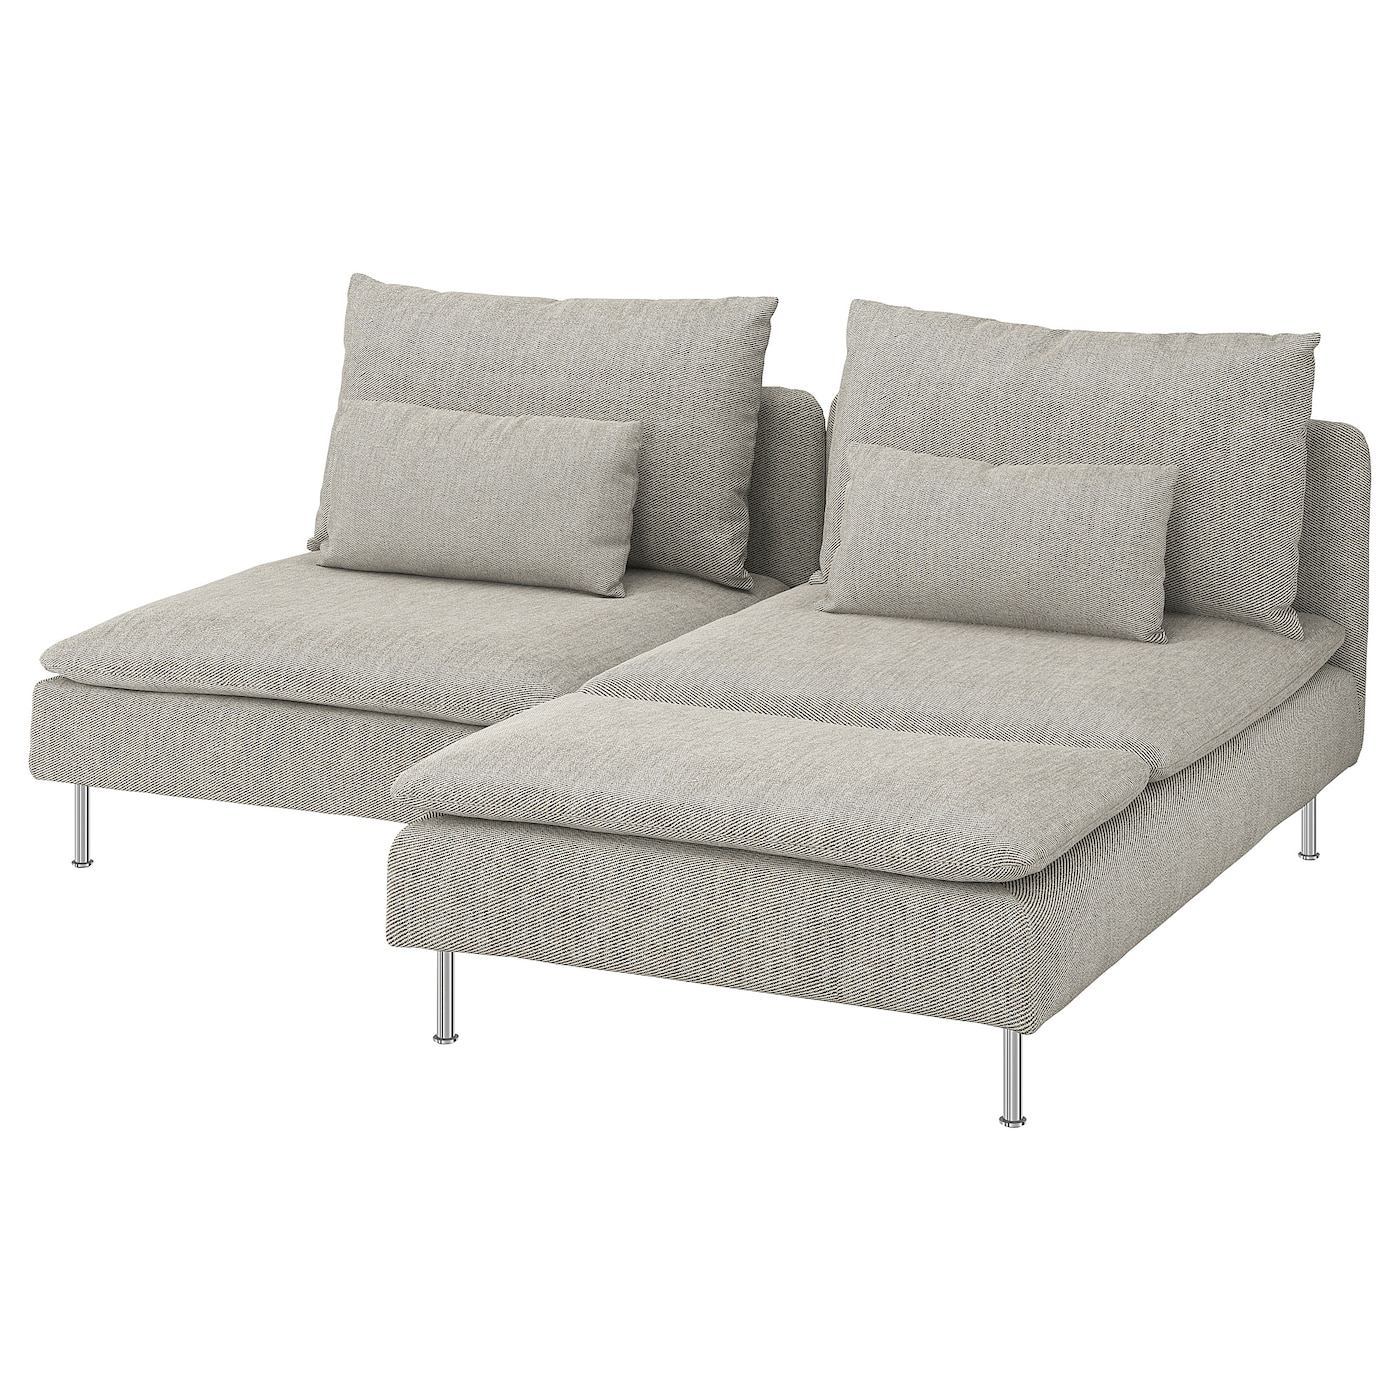 SÖDERHAMN 2-seat sofa - with chaise longue, Viarp beige ...